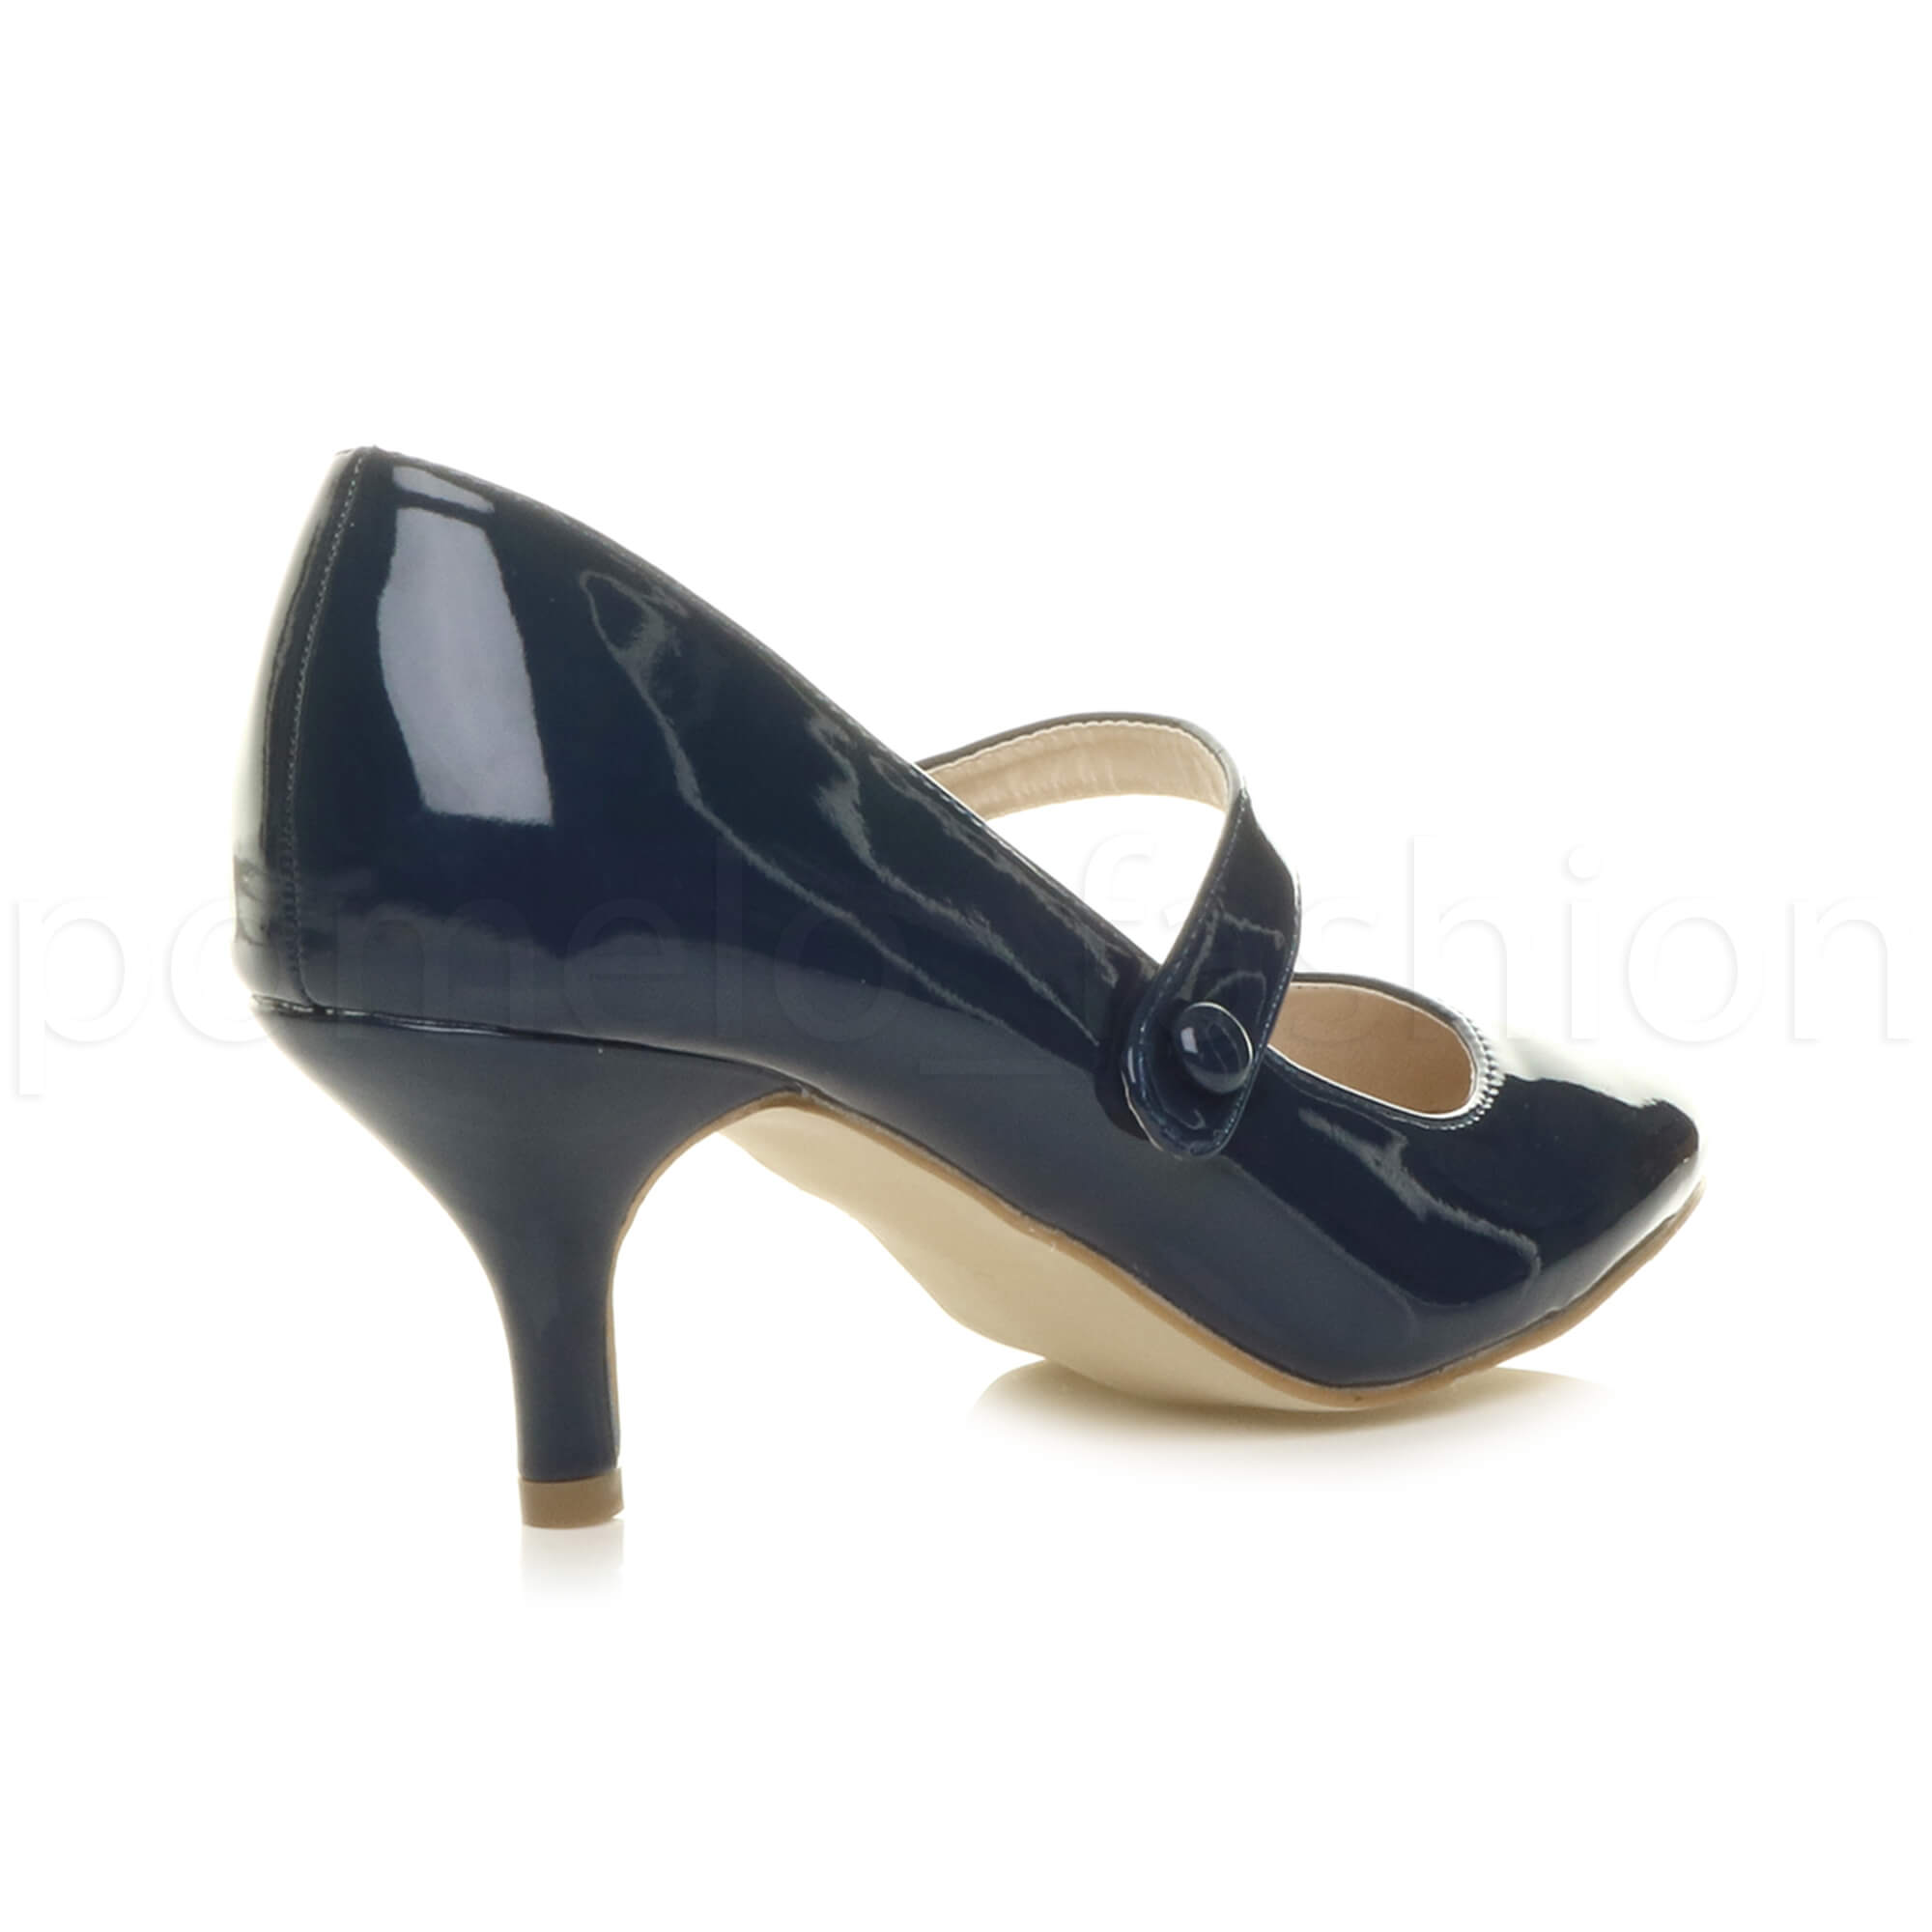 miniatura 103 - Donna basso tacco medio Mary Jane Damigella Matrimonio Pompe Scarpe Da Sera Taglia